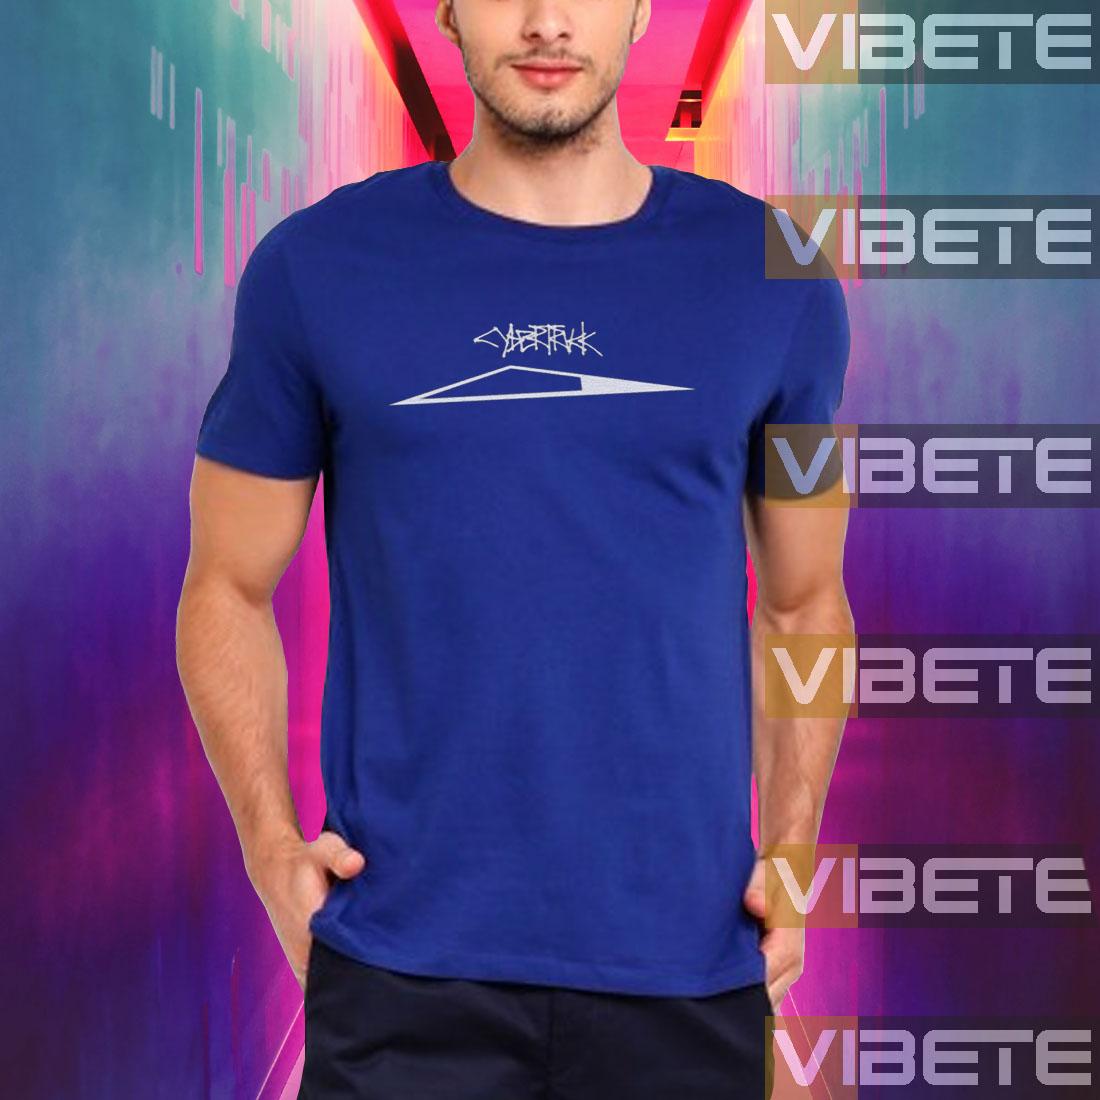 Tesla Cybertruck Bulletproof Shirts